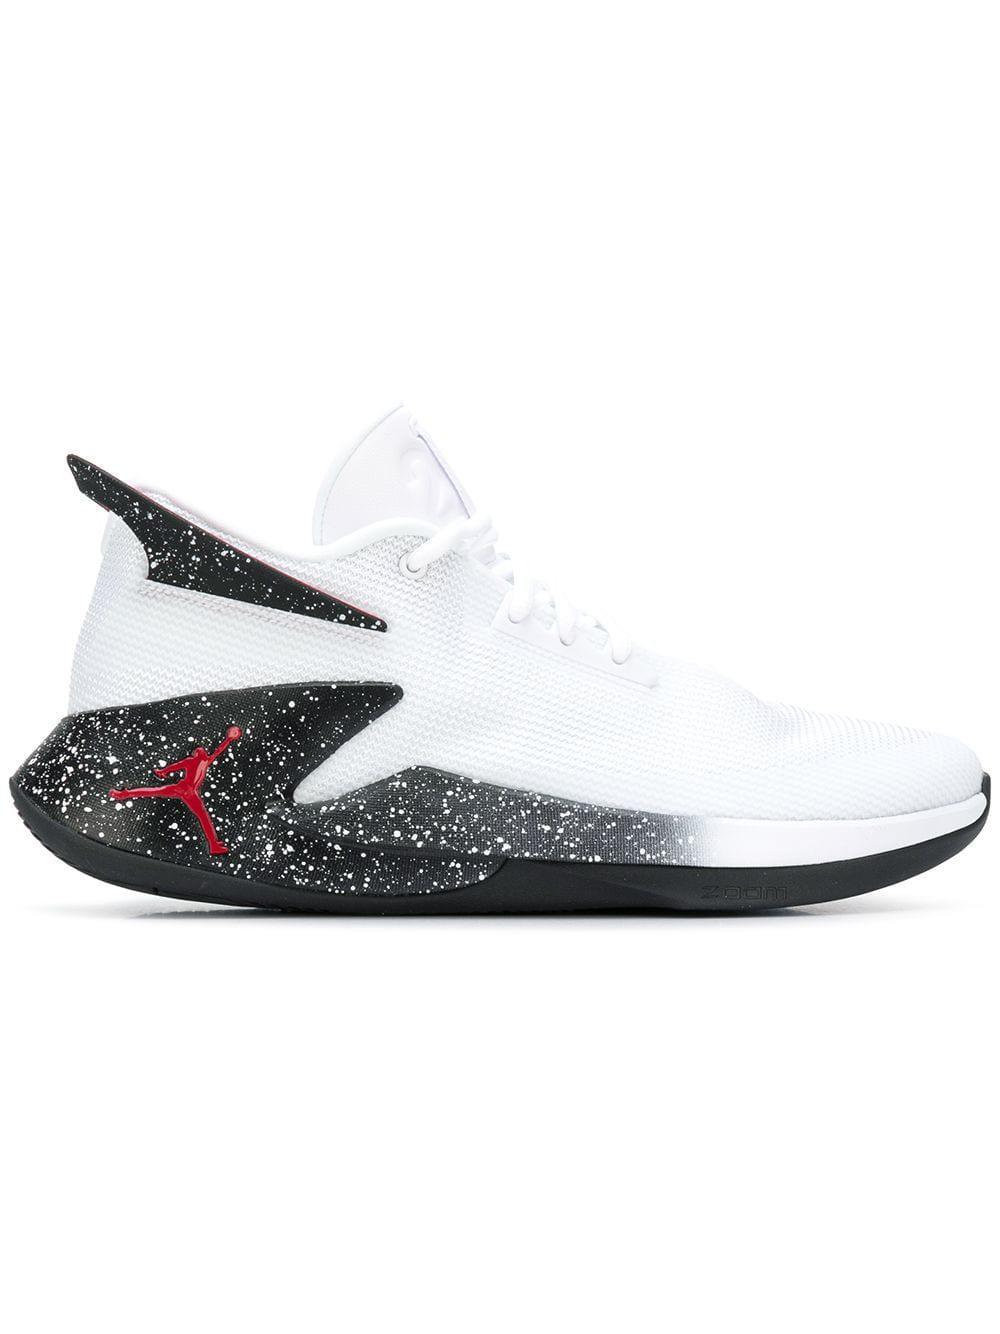 factory price 86e45 9fe0a Nike Jordan Fly Lockdown Sneakers in White for Men - Lyst